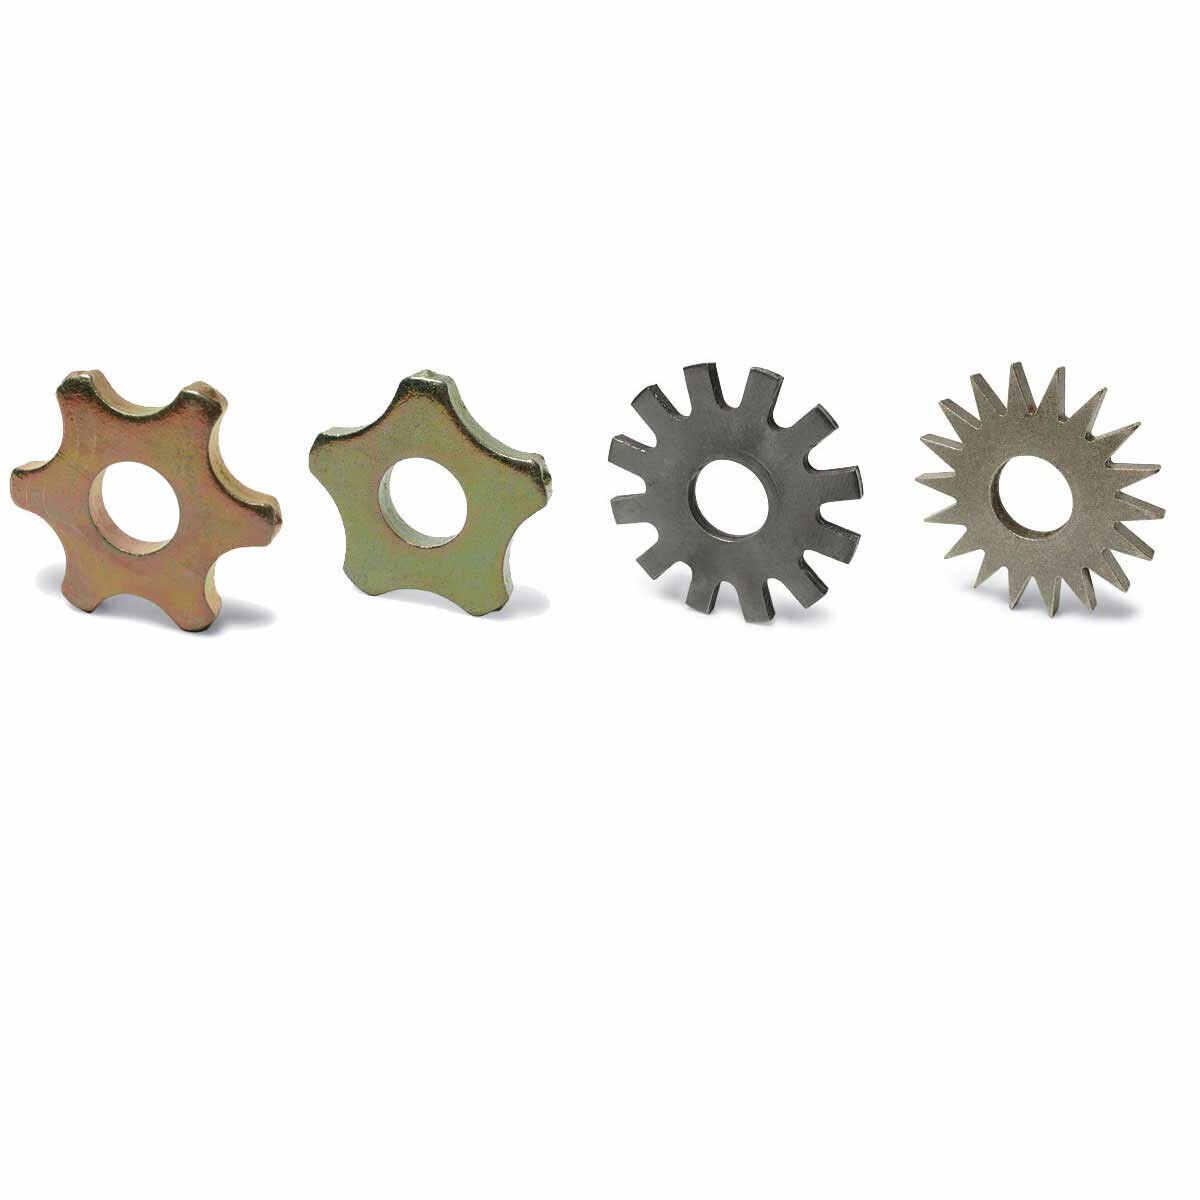 MK Diamond Scarifier Carbide Cutters